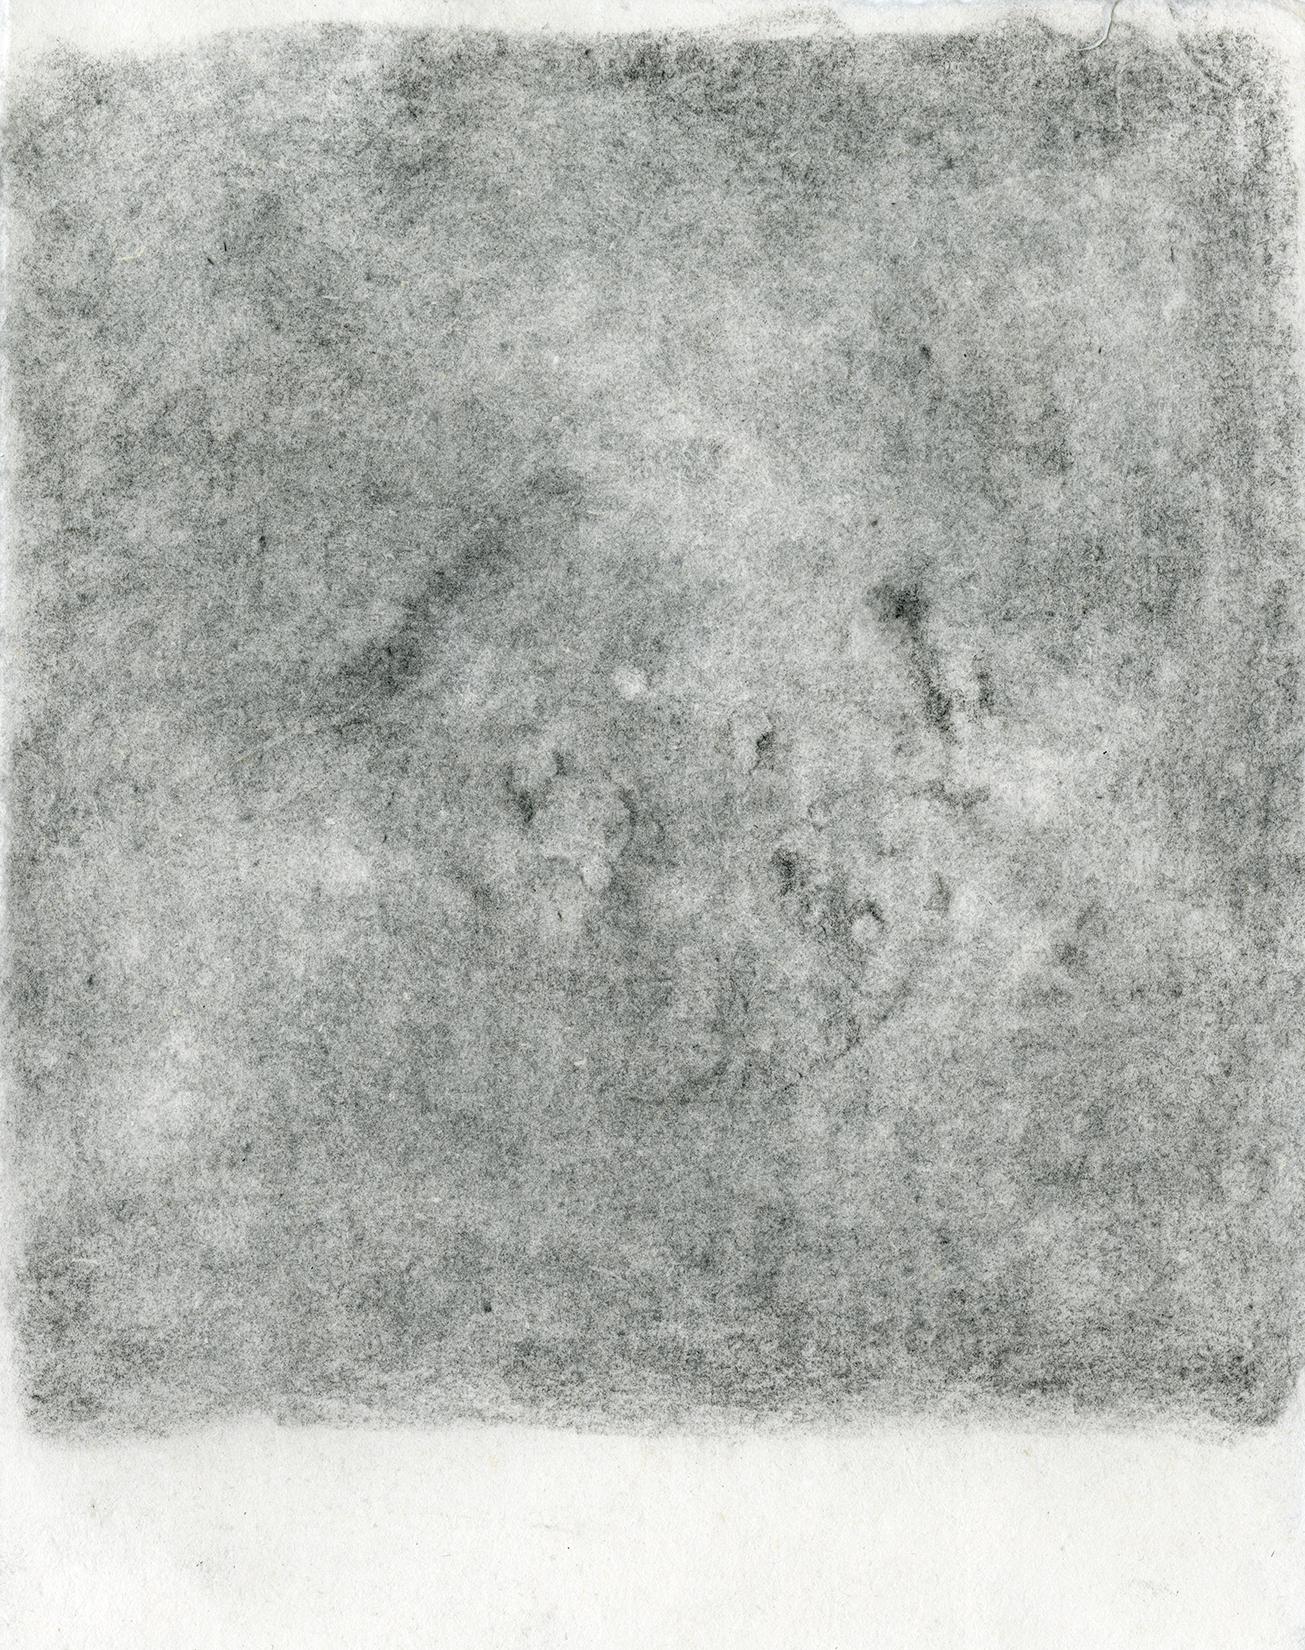 Planet Pencil on Paper 6x4.5.jpg